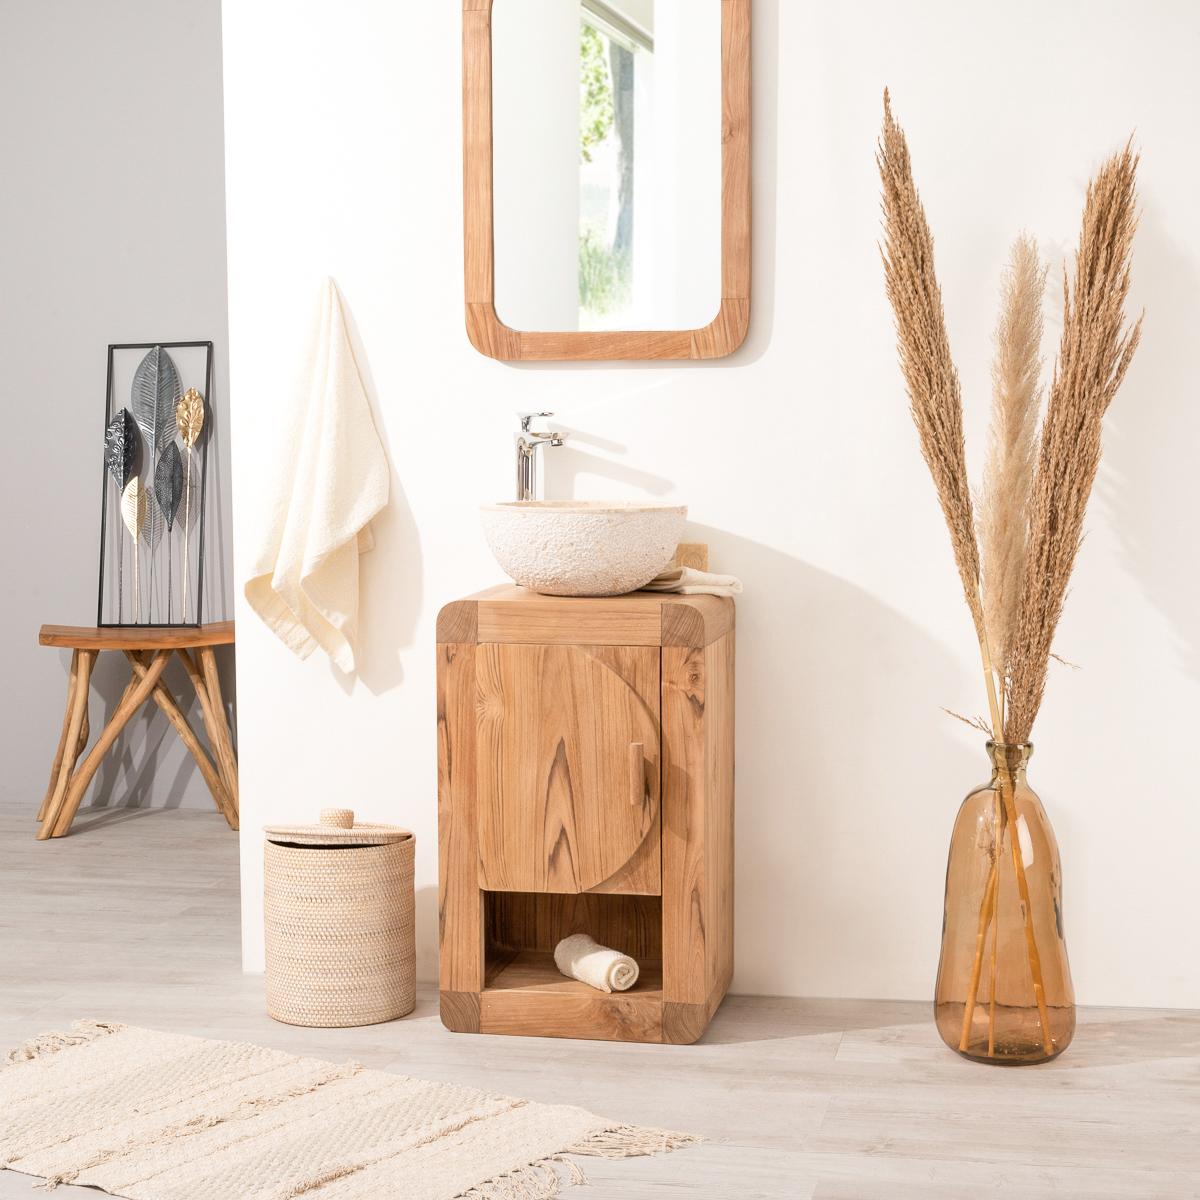 petit meuble de salle de bain. Black Bedroom Furniture Sets. Home Design Ideas